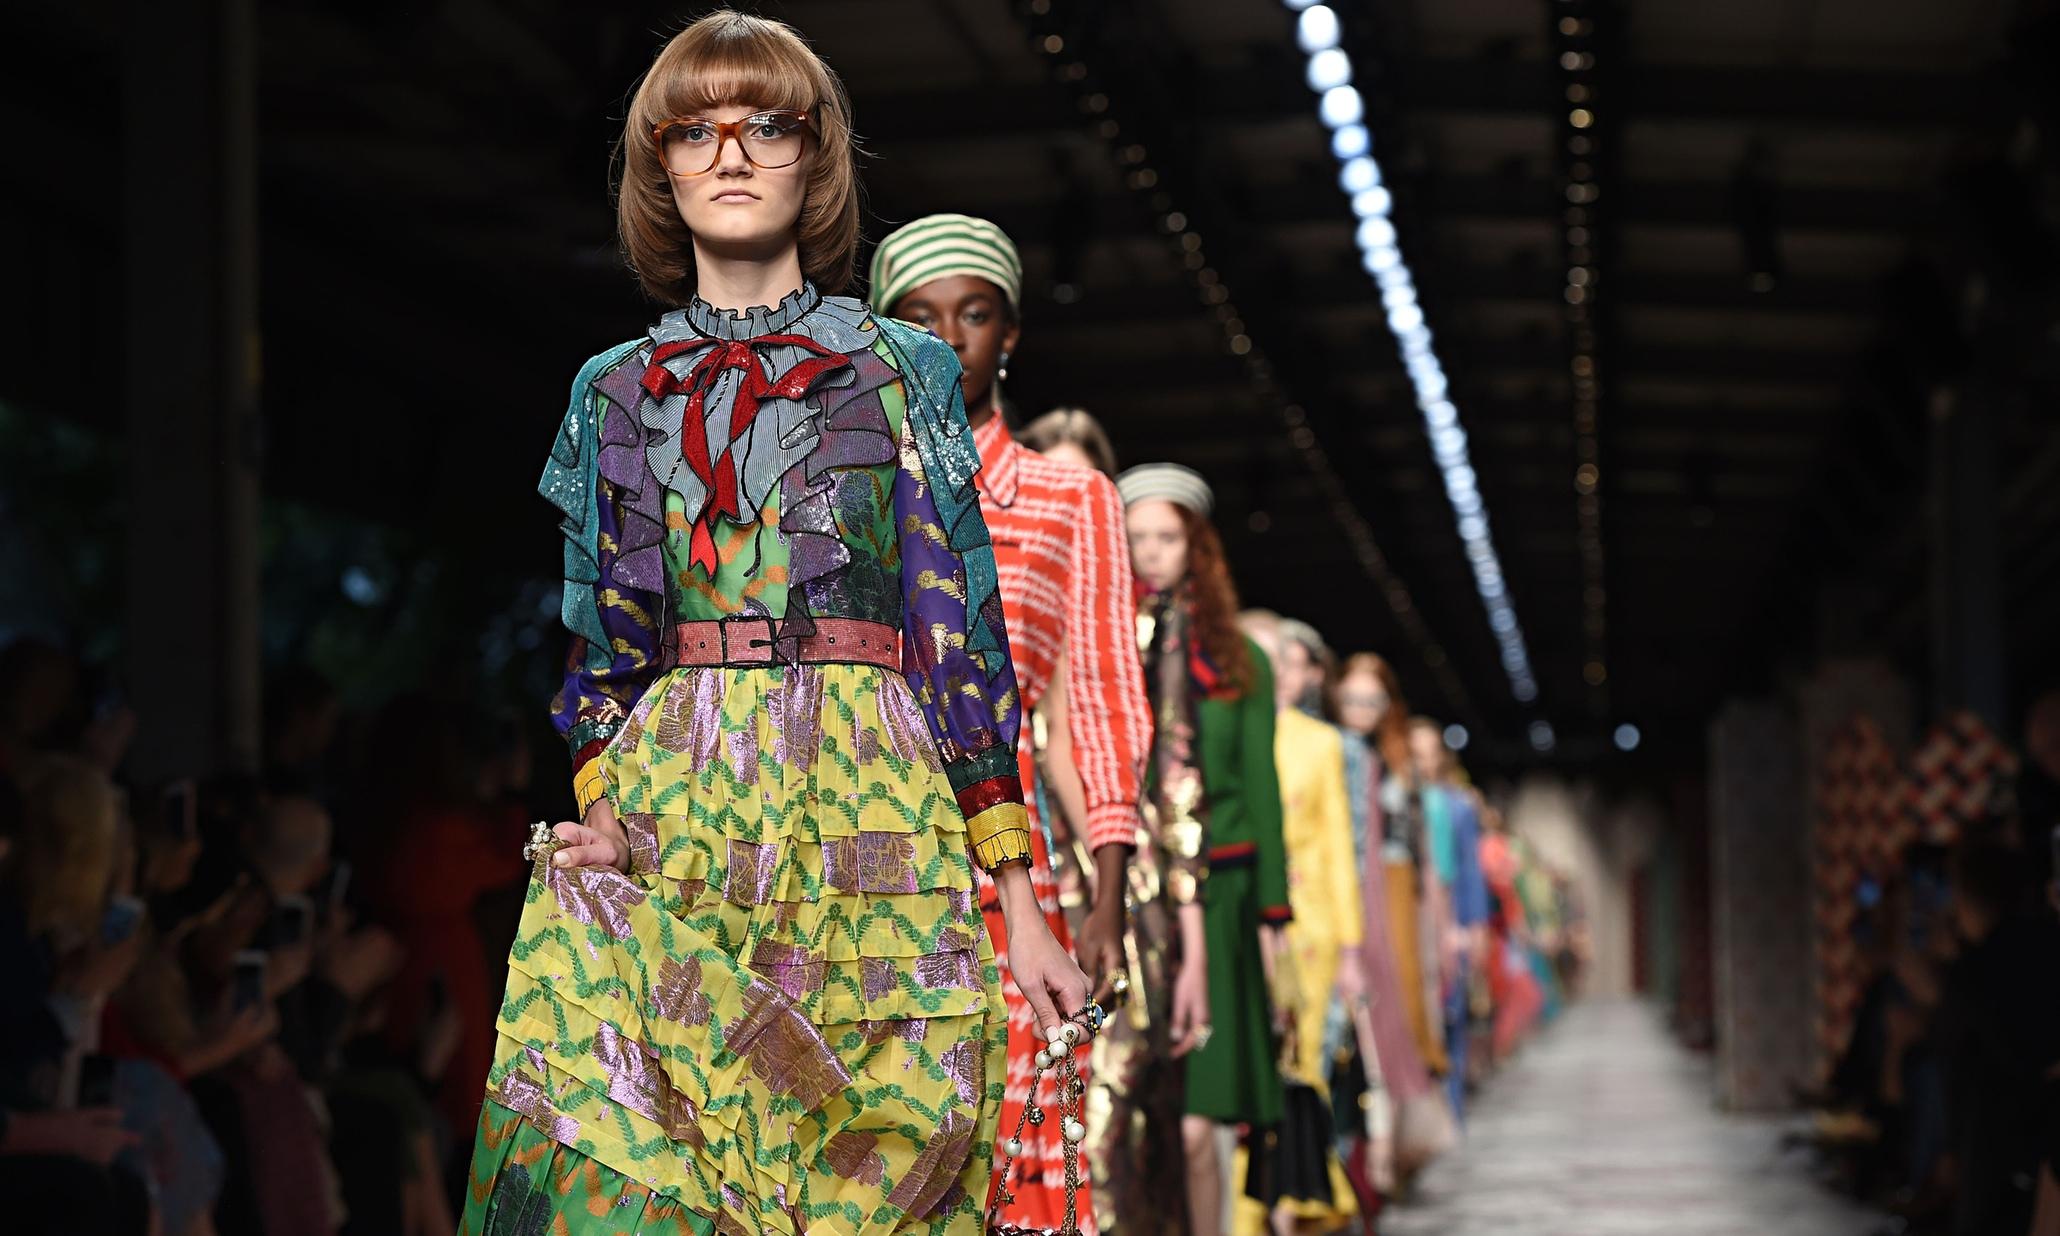 Sfilata Gucci F/W 2016 moda genderless